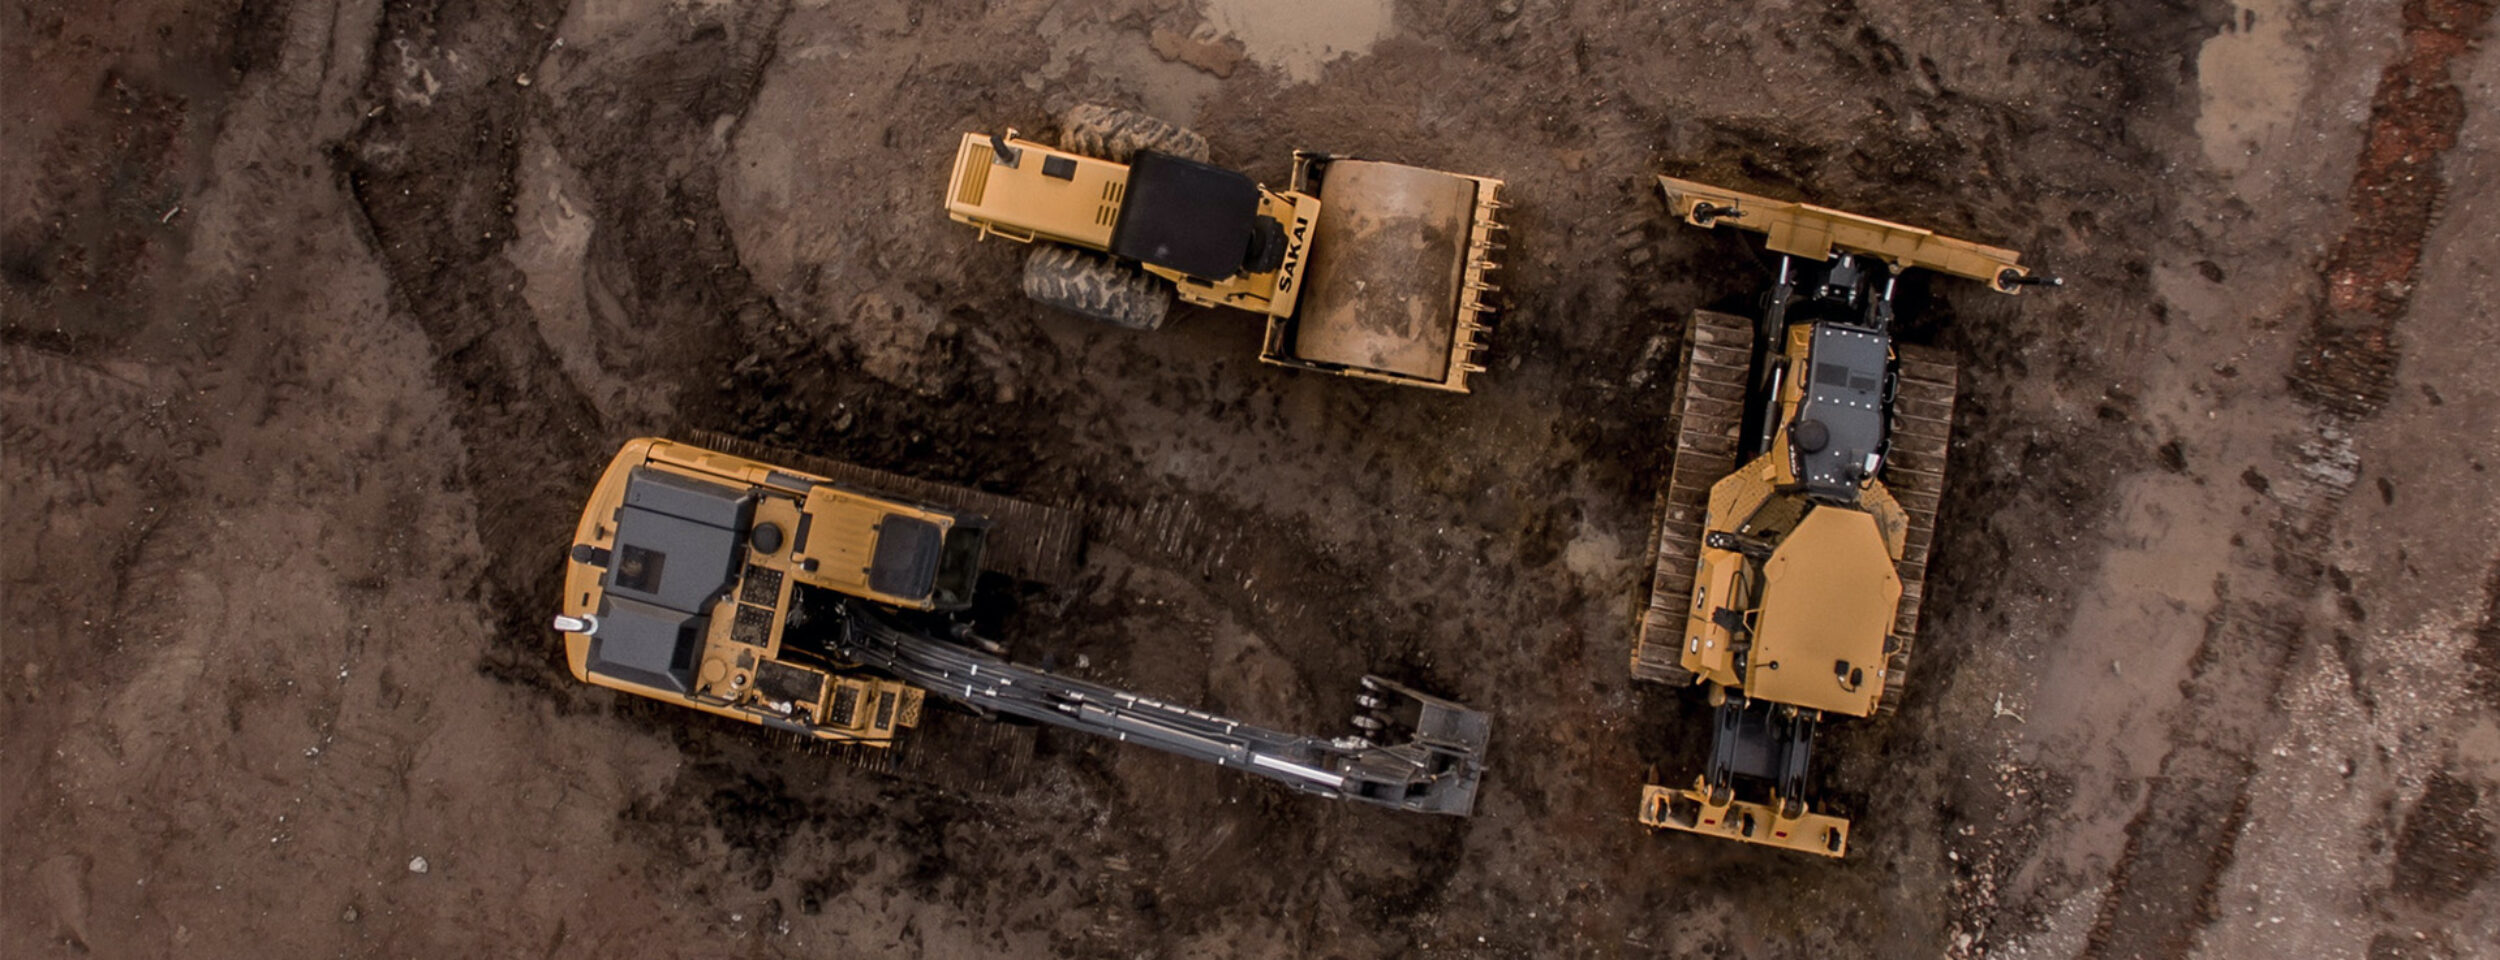 Excavators From Above